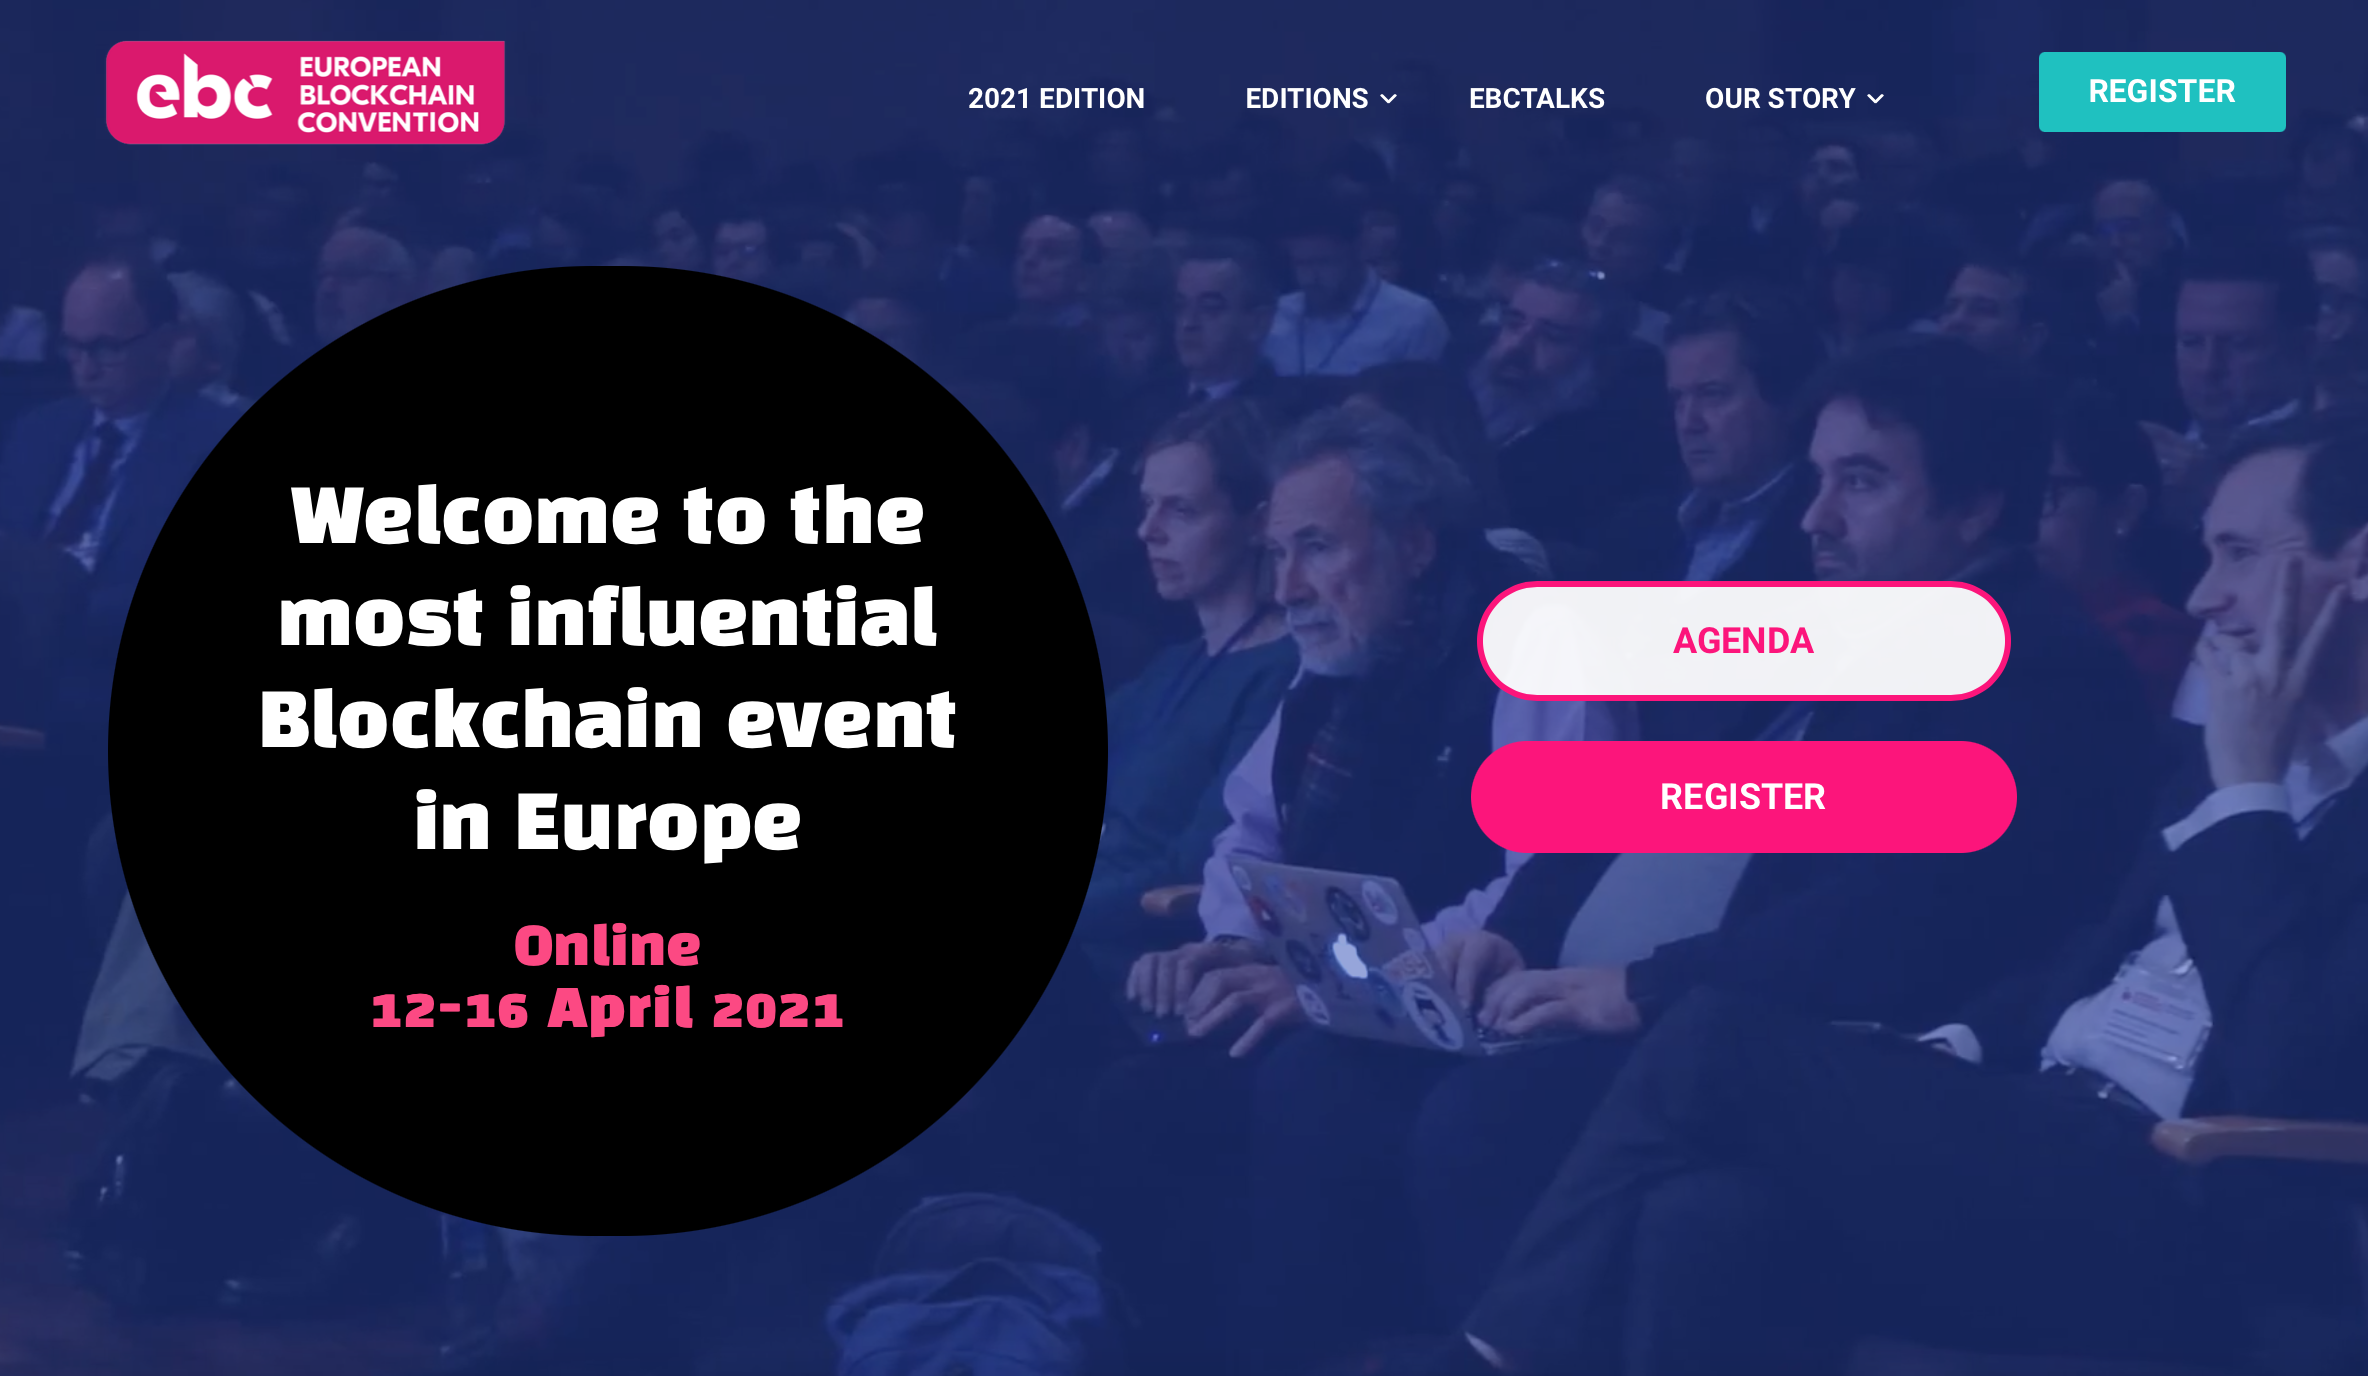 Screenshot of website - European Blockchain Convention 2021